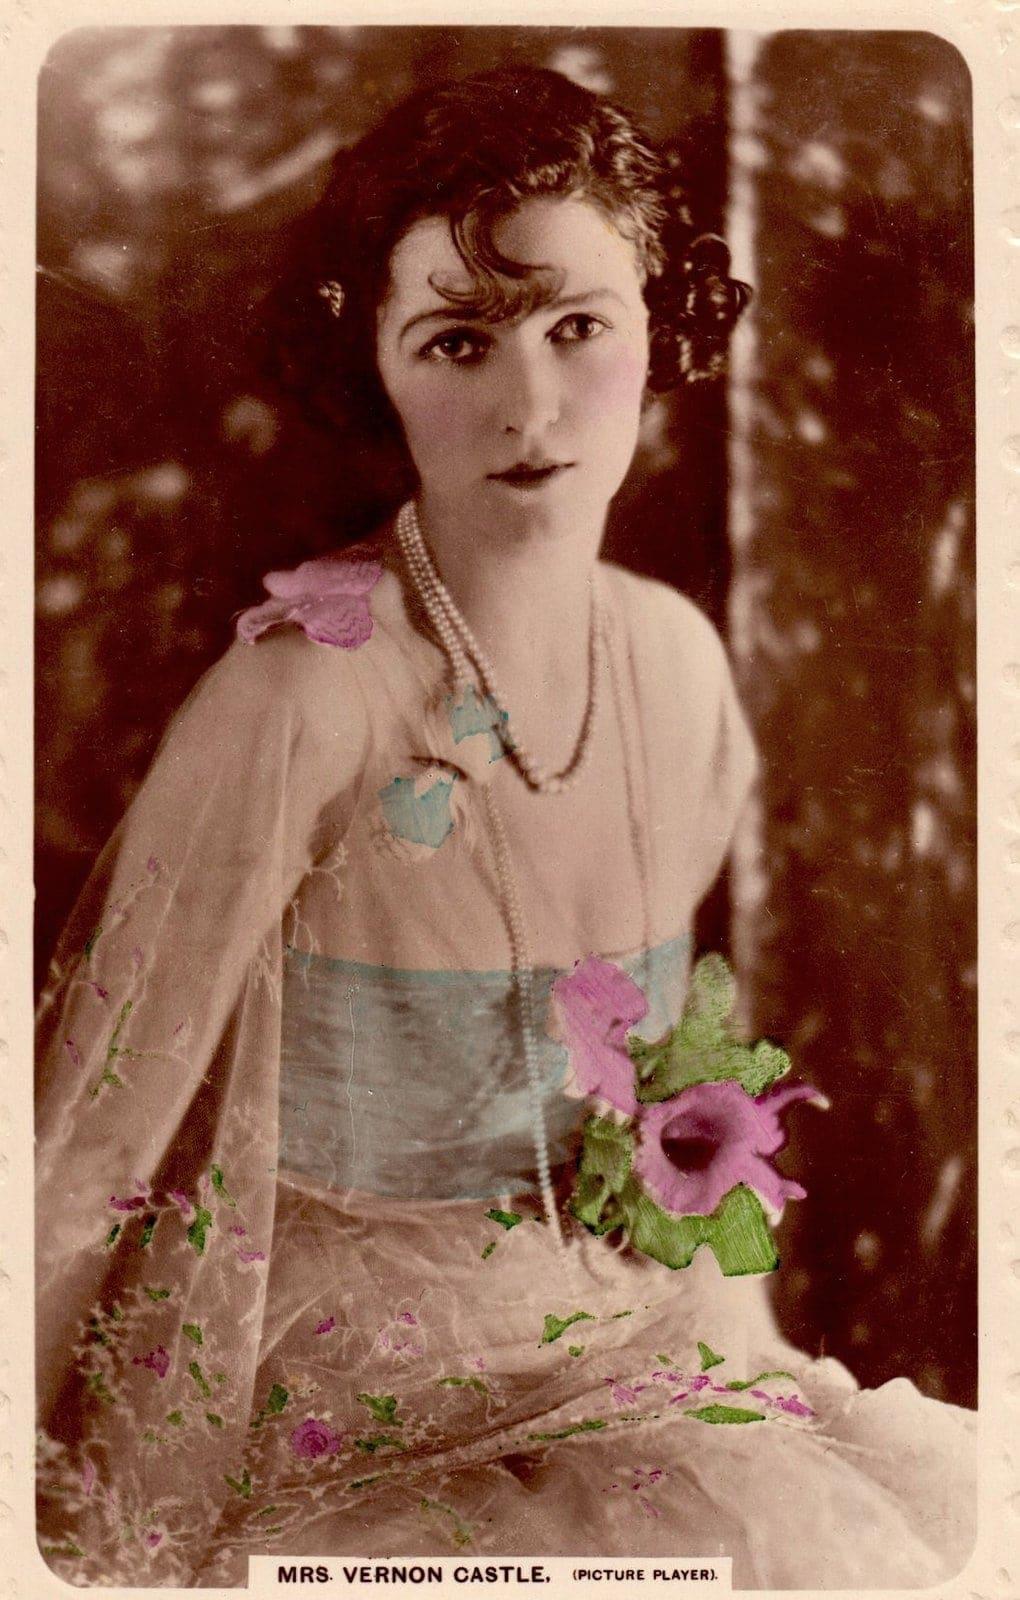 Mrs Vernon Castle - Irene Castle - Bobbed hairstyle c1917